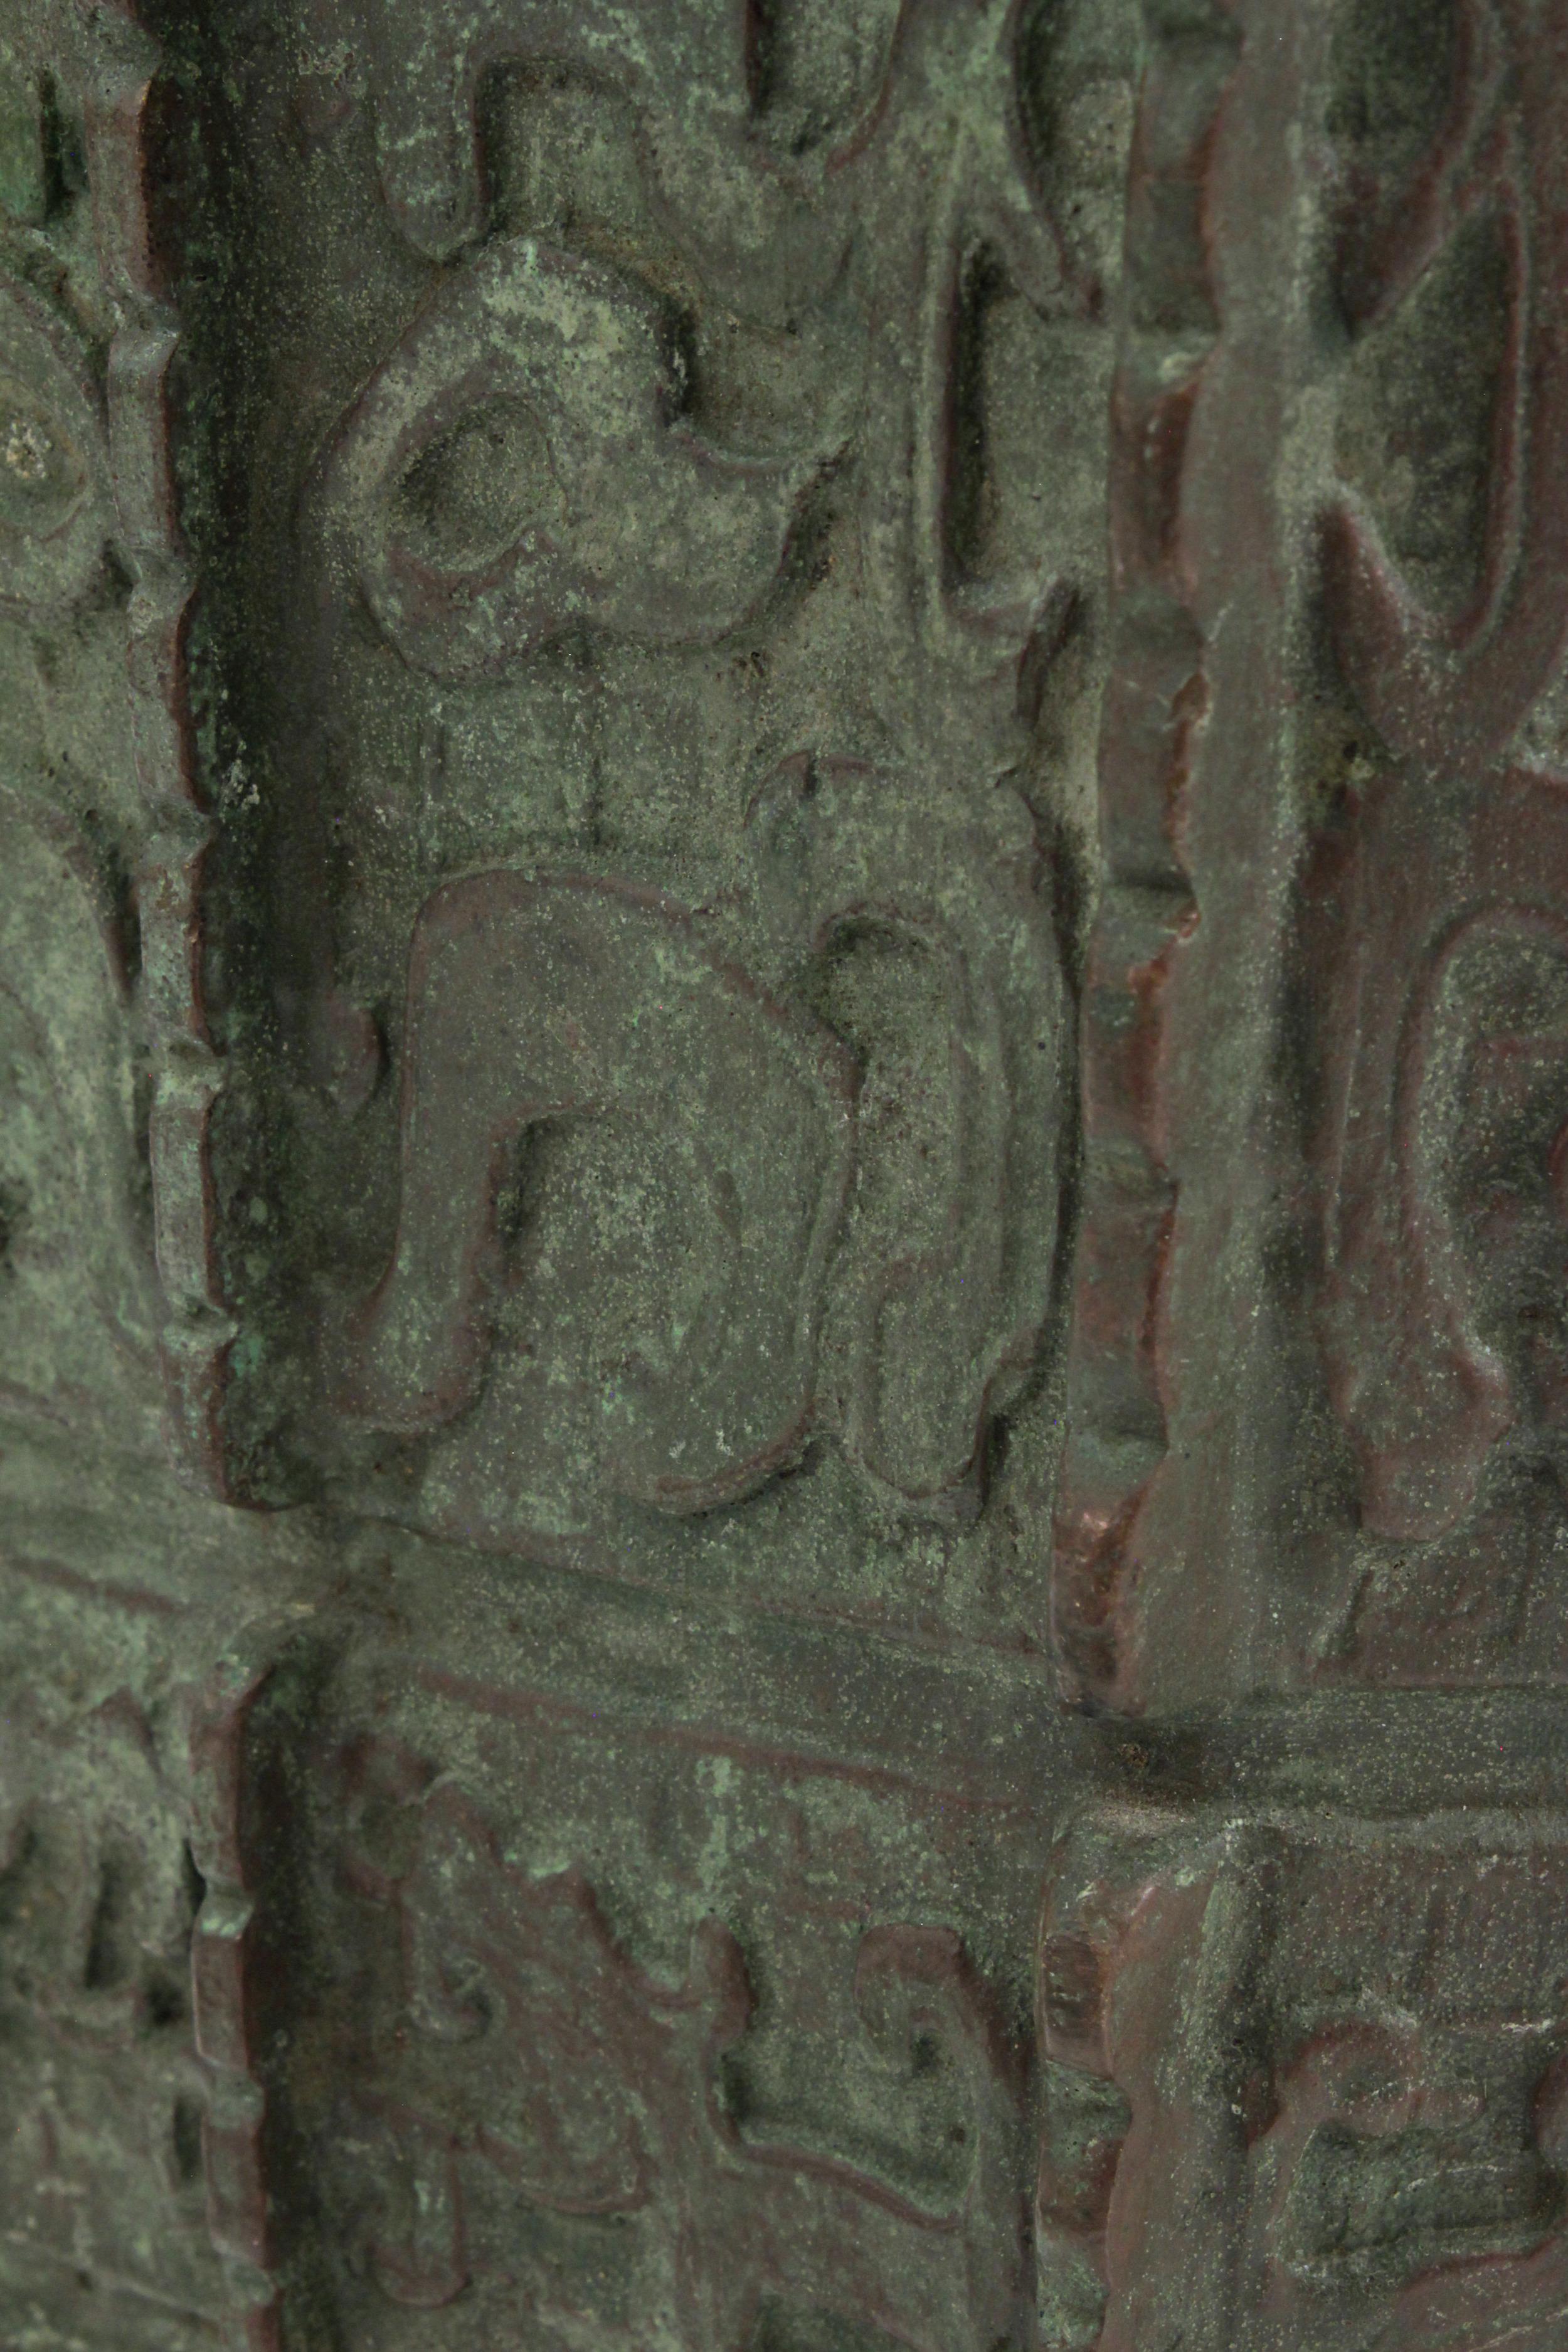 40's 55 Chinese bronze urns tablelamps318 detai4 hires.jpg